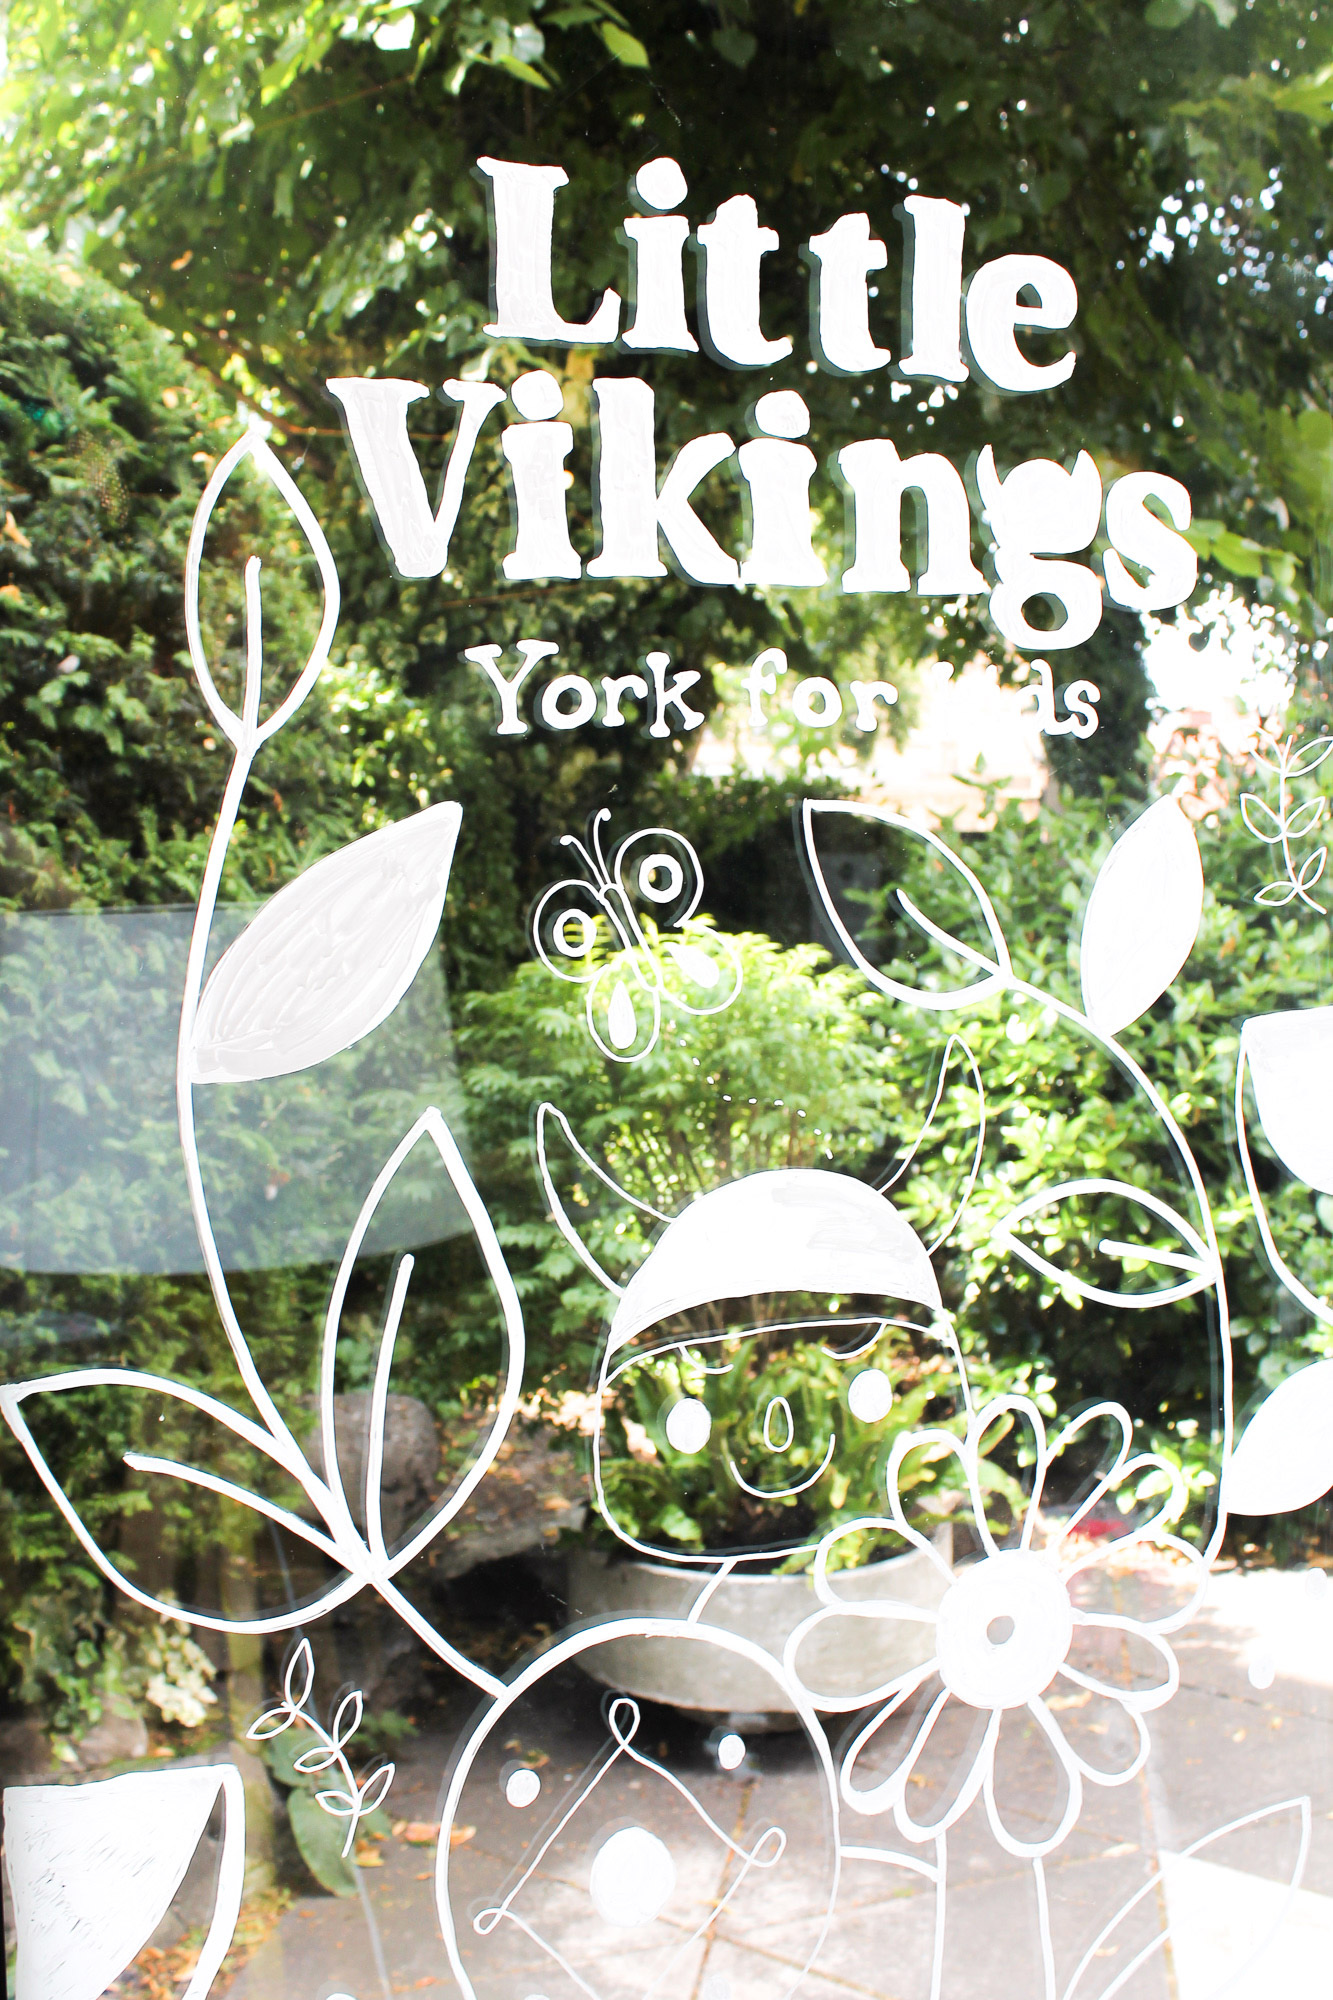 York Theatre Royal Little Vikings Mural Illustration Buttercrumble